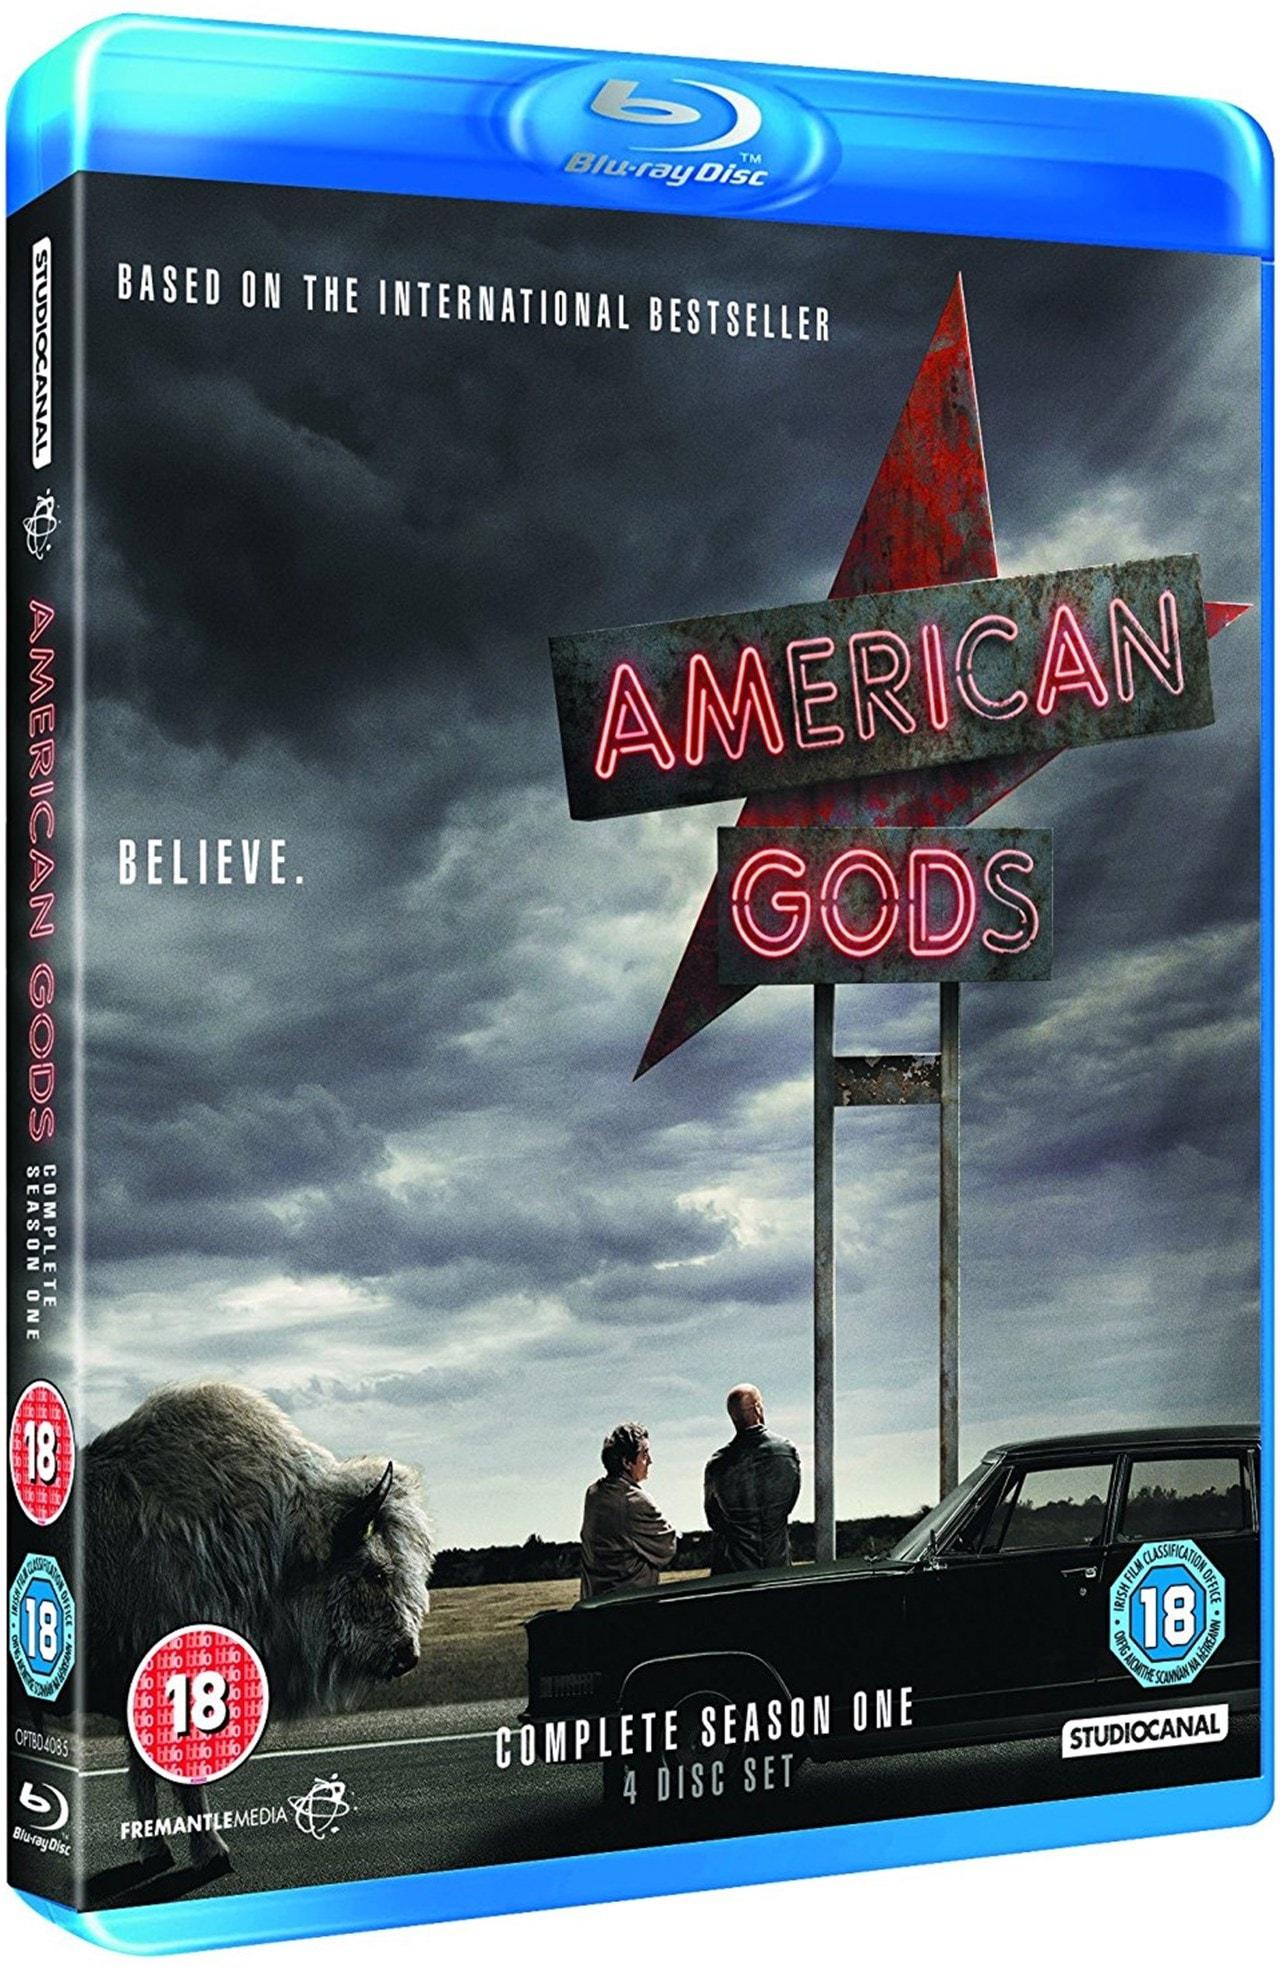 American Gods: Complete Season One - 2